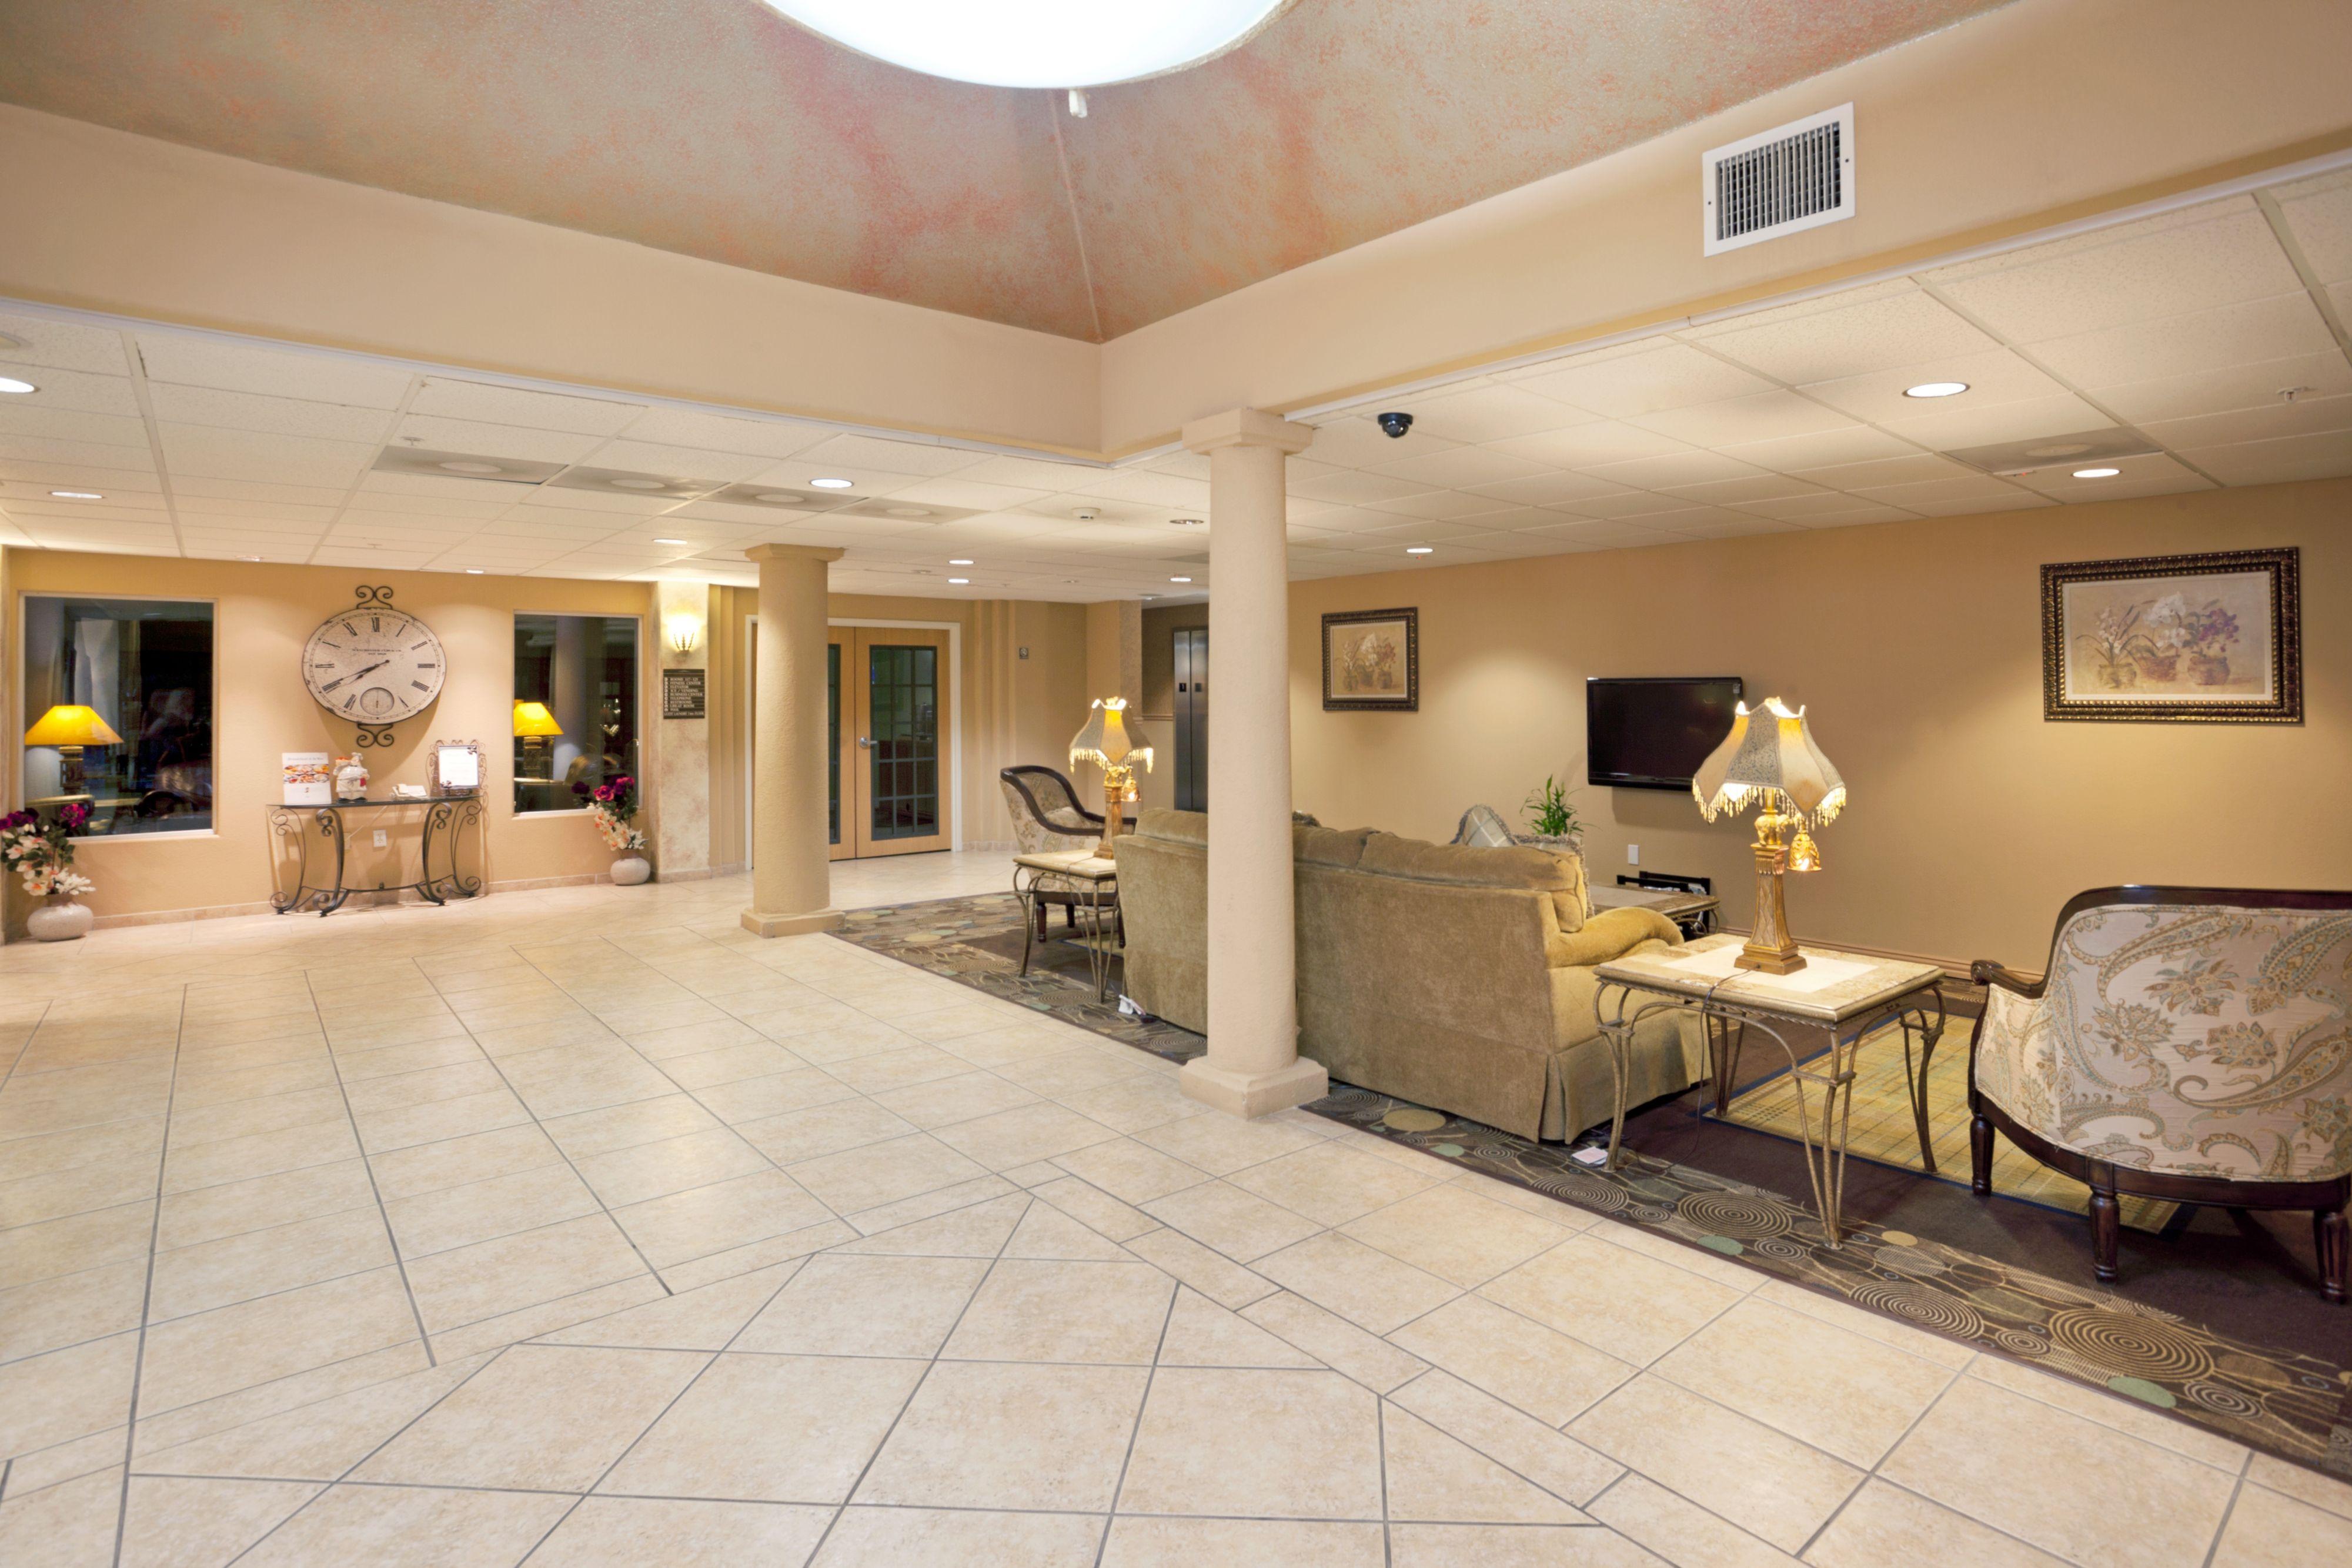 Holiday Inn Express & Suites Elgin image 4